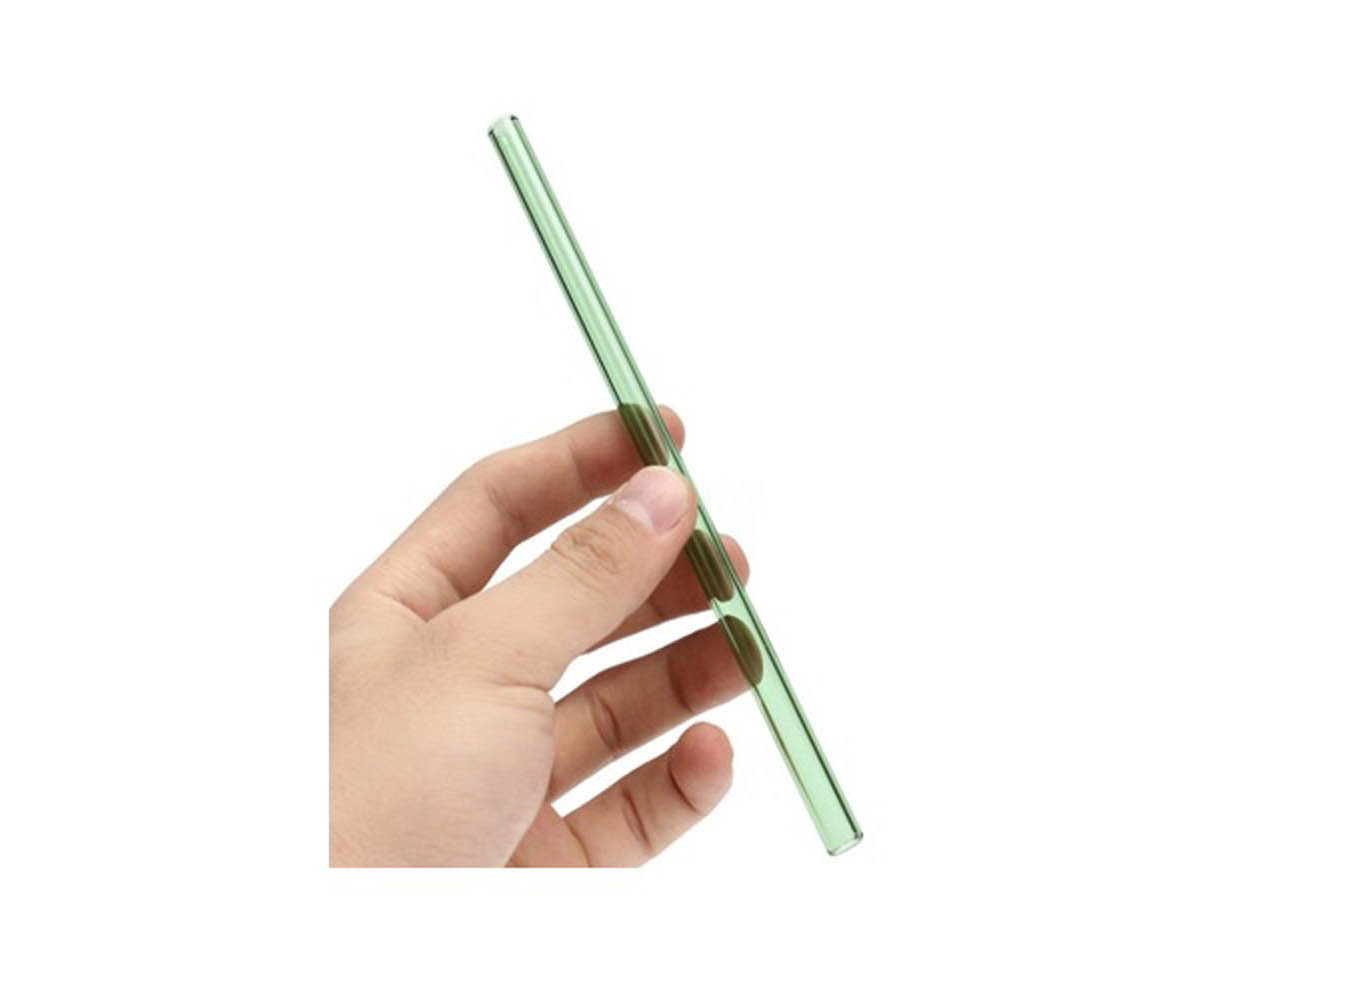 Custom Reusable Glass Drinking Straw